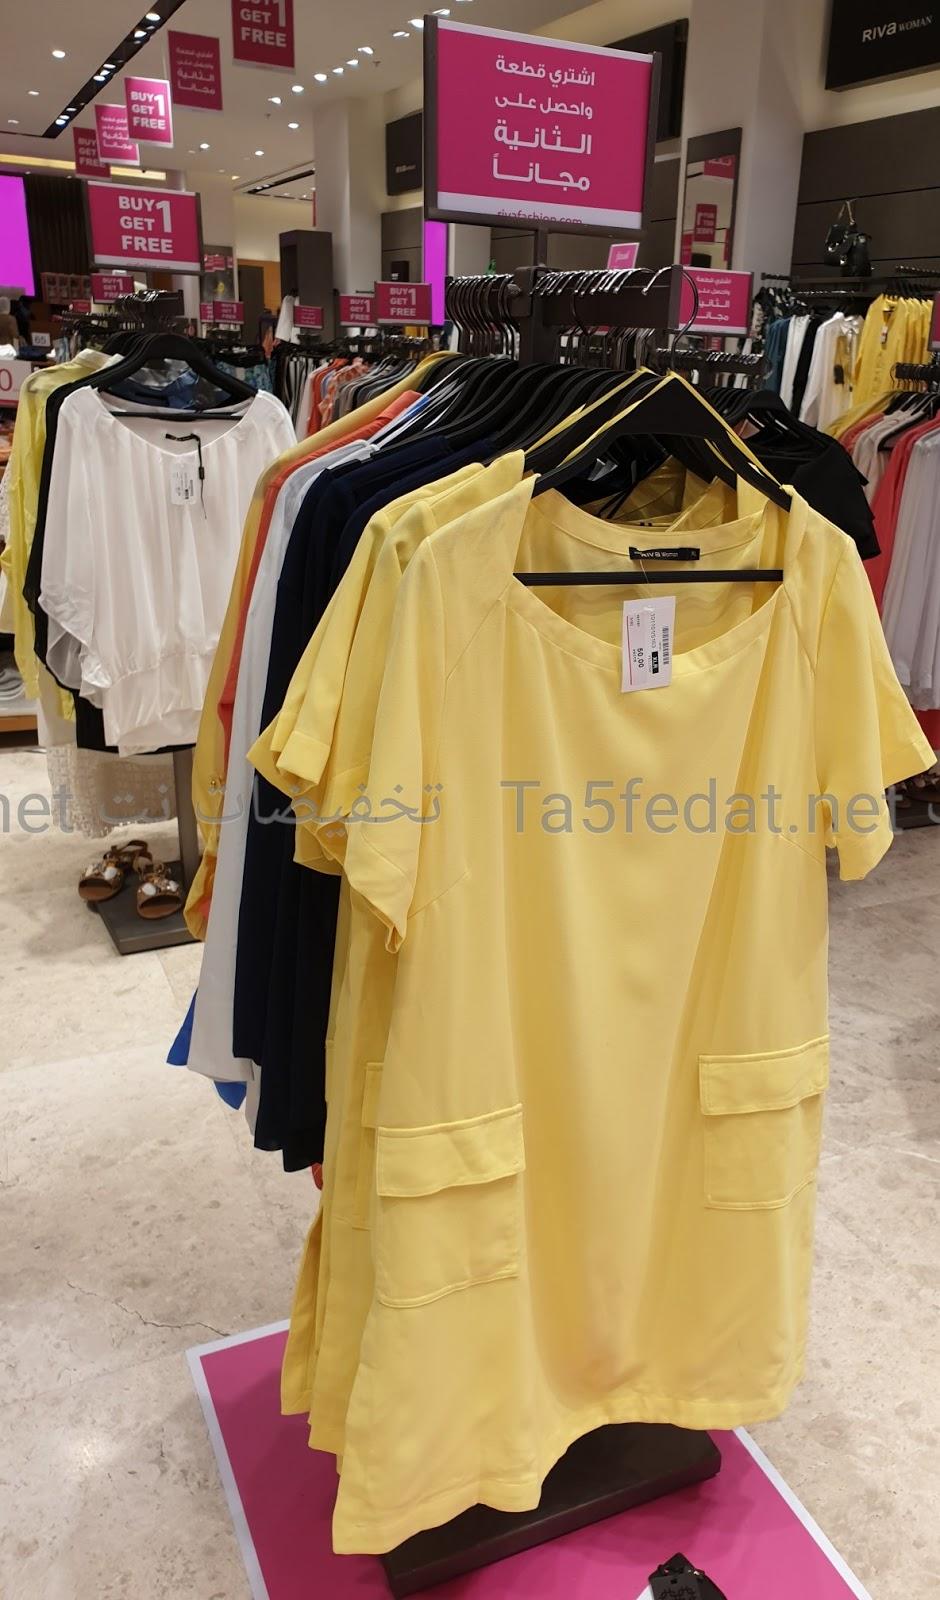 83d5a8ee6 عروض وتخفيضات ريفا Riva للملابس النسائية والأطفال